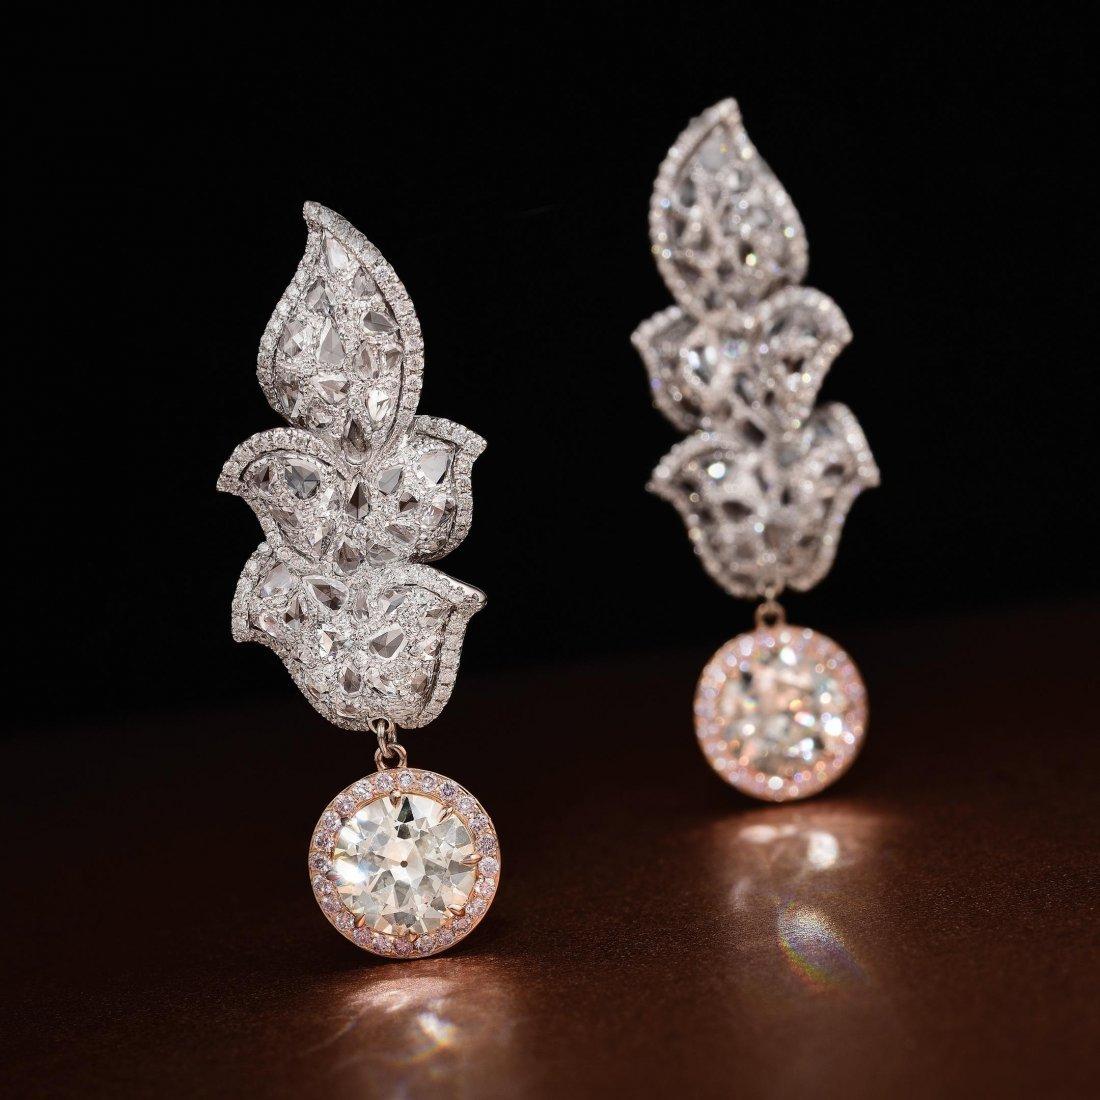 A Pair of Old European-Cut Diamond Earrings